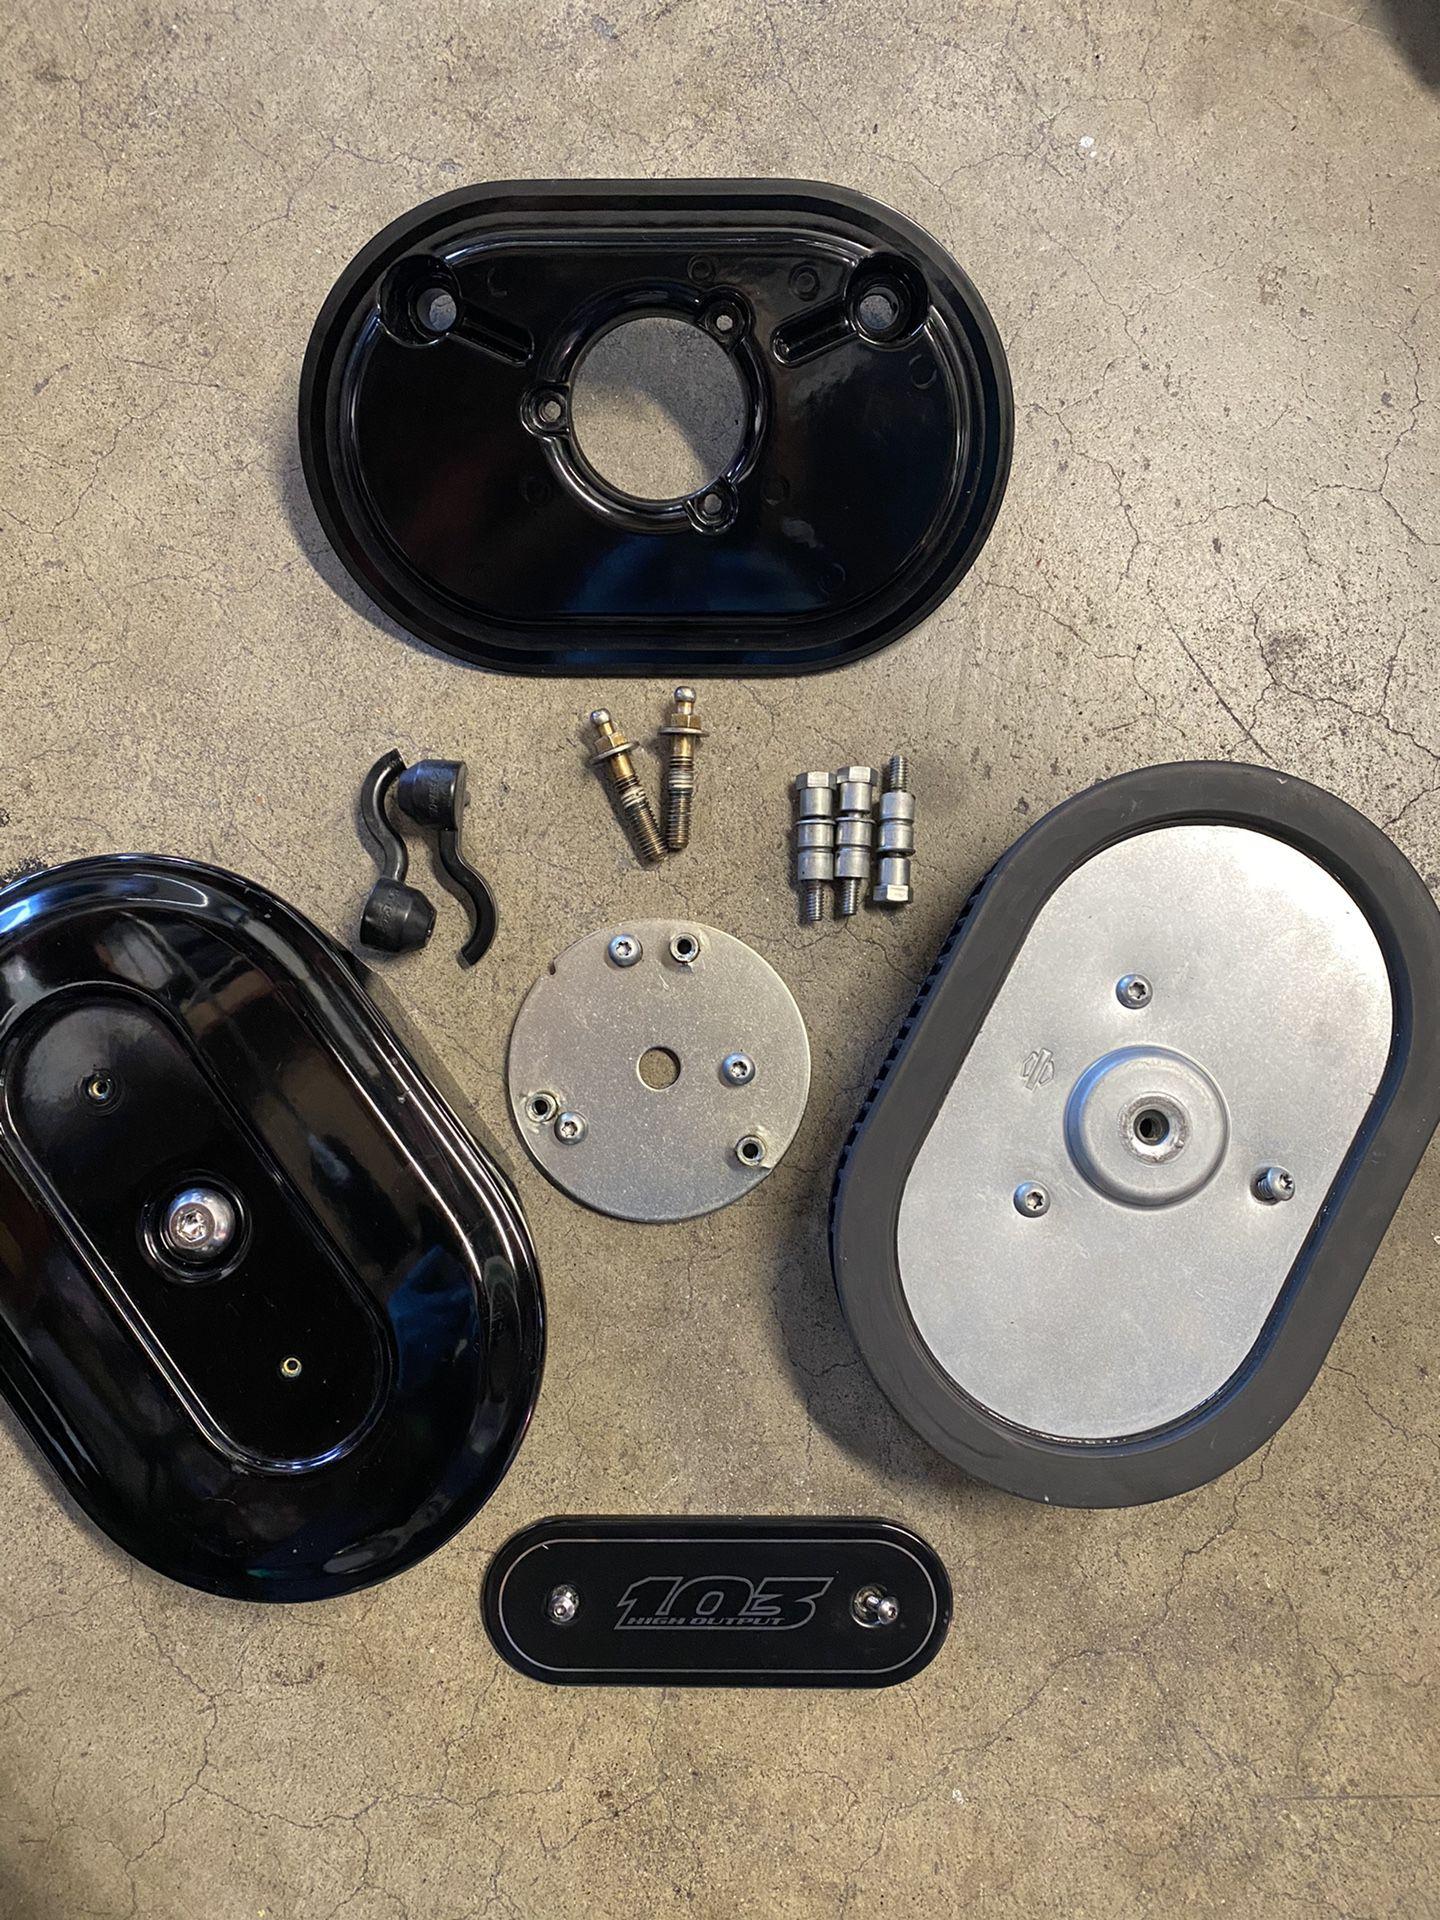 Harley Davidson Dyna Air cleaner (complete)